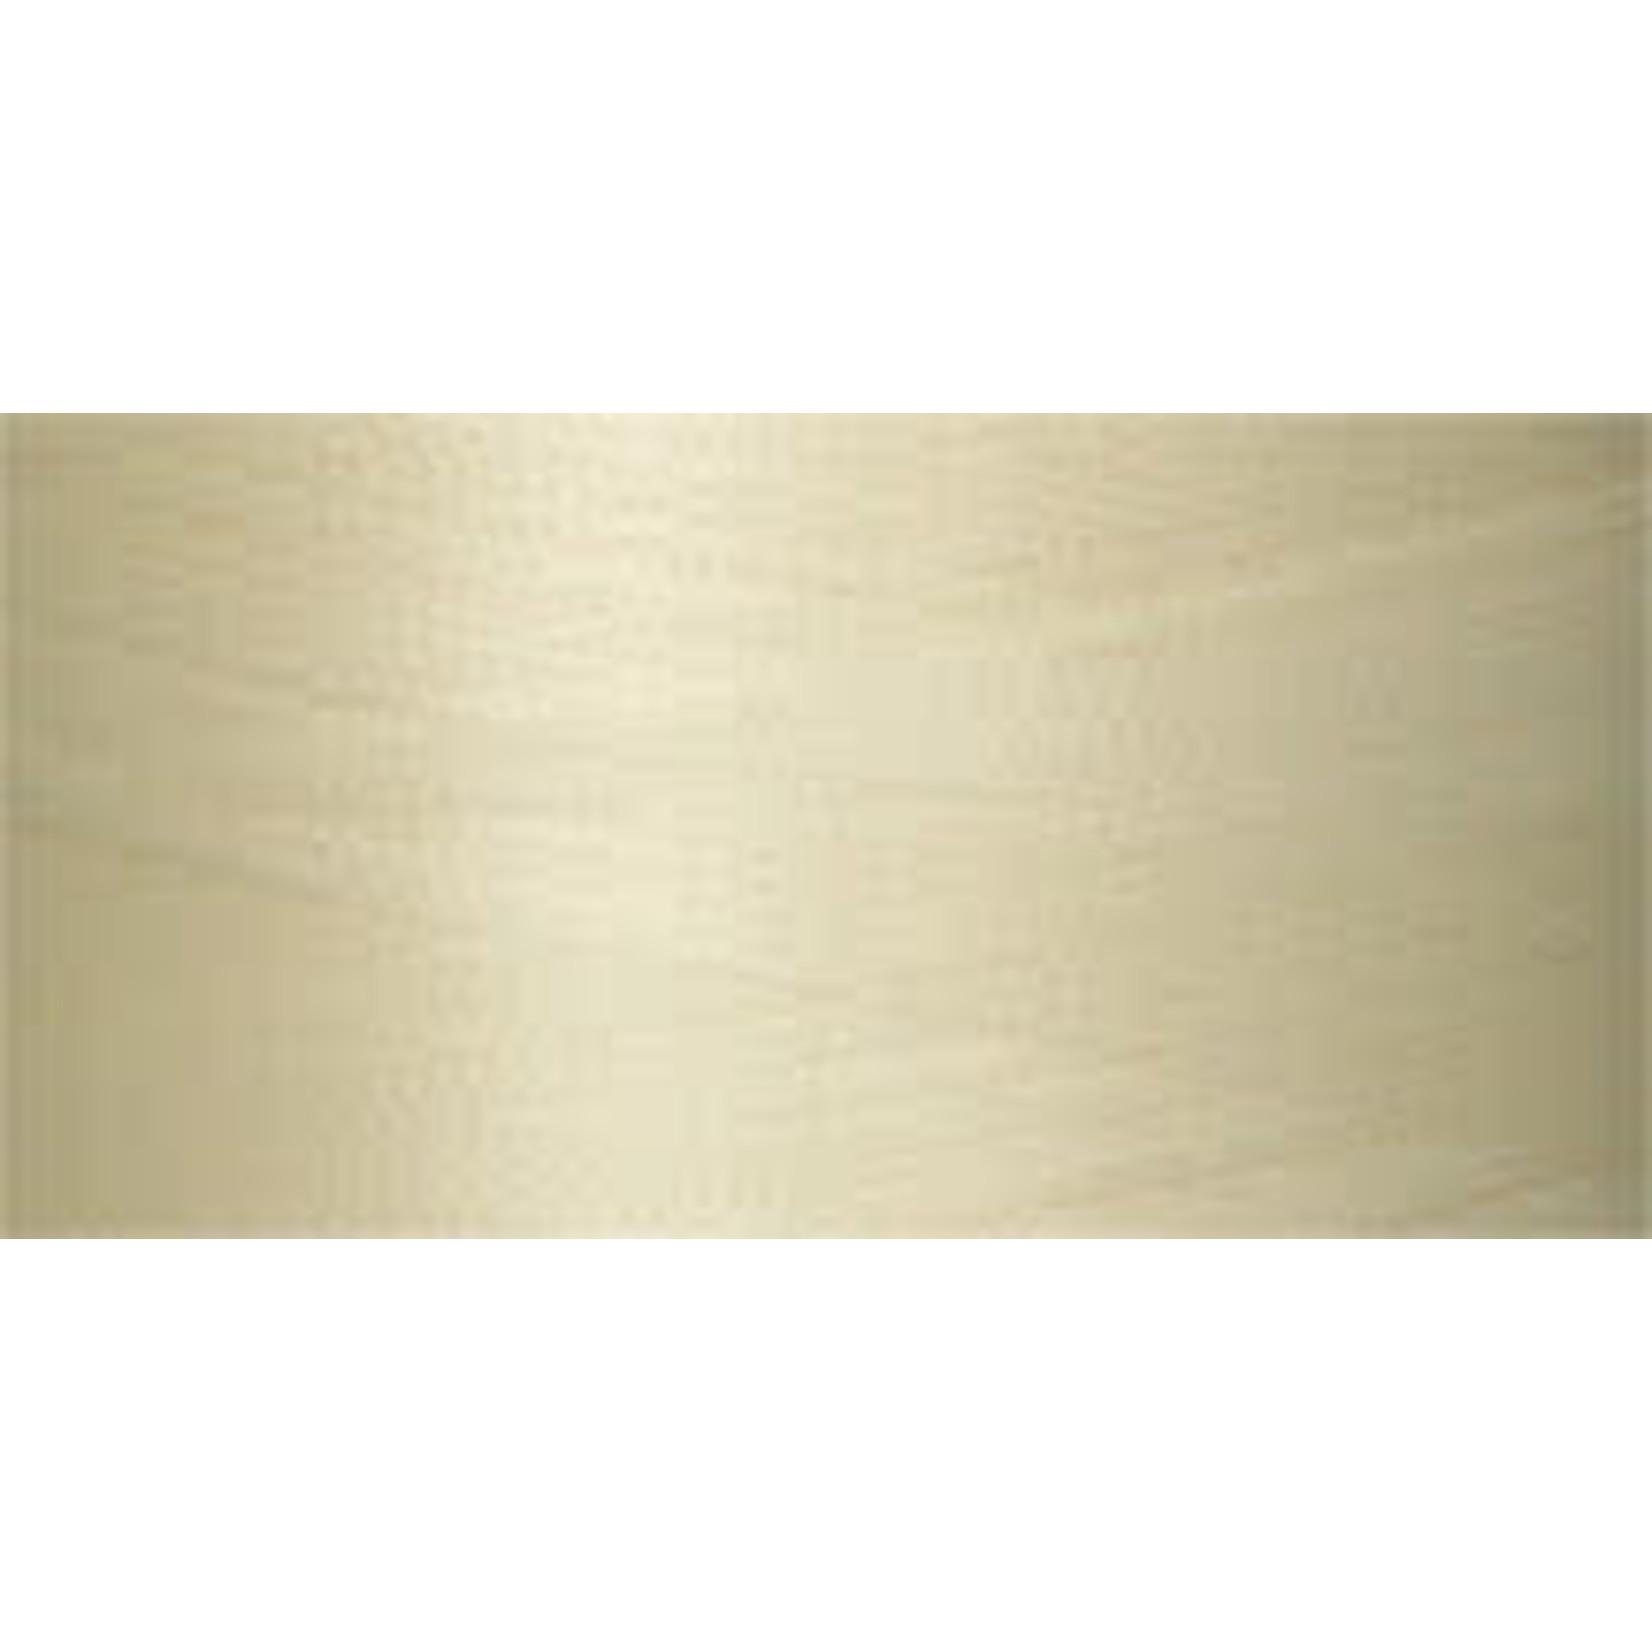 Superior Threads Bottom Line - #60 - 1300 m - 620 Cream